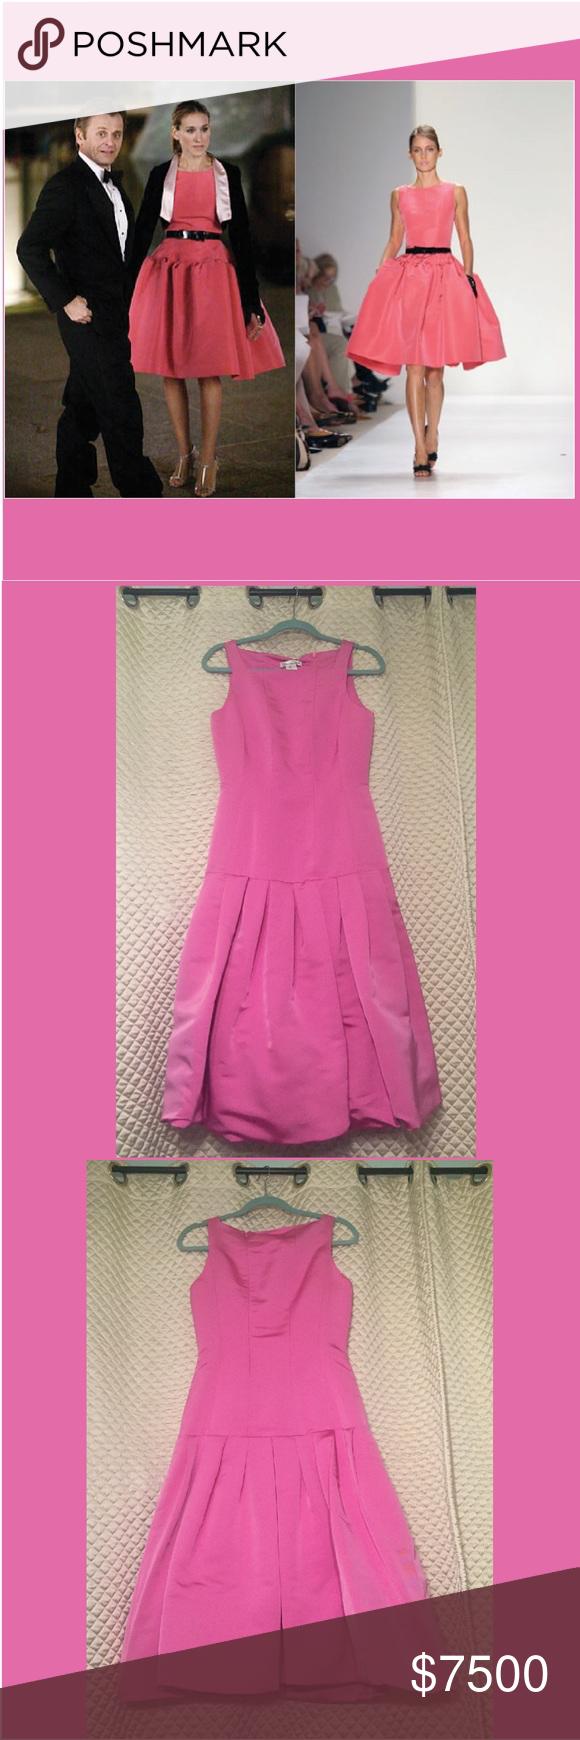 Oscar de la Renta NWT Pink Silk Faille Dress Sz 4